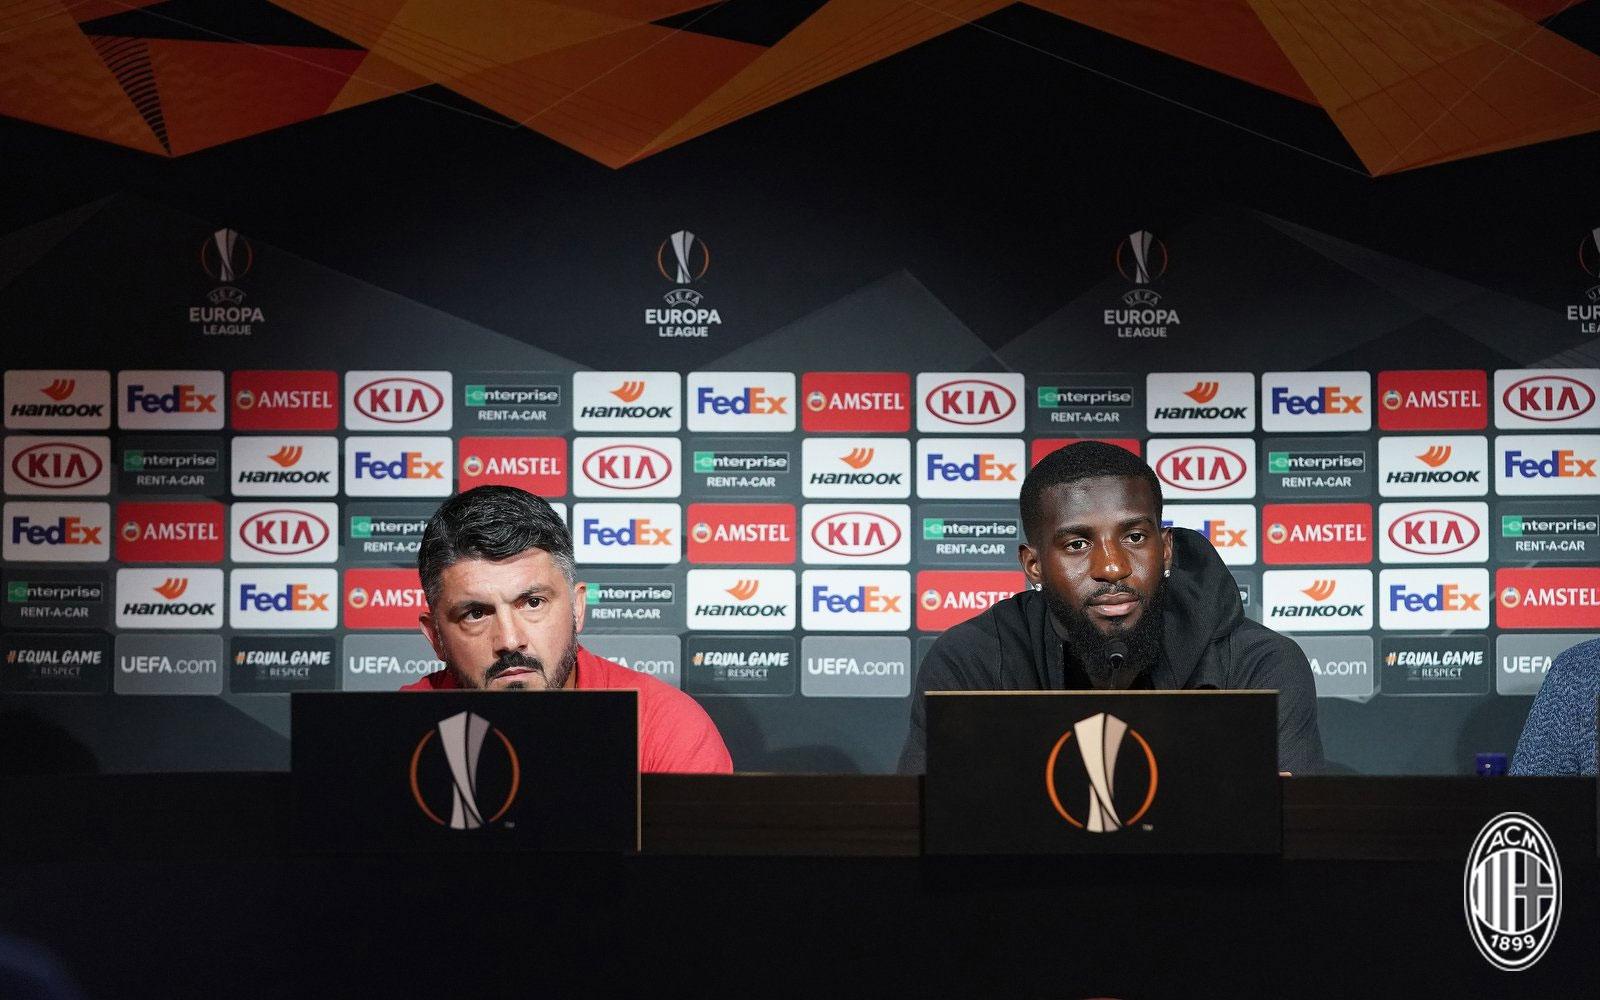 Tiémoué Bakayoko and Gennaro Gattuso during a press conference at Milanello. (@acmilan.com)